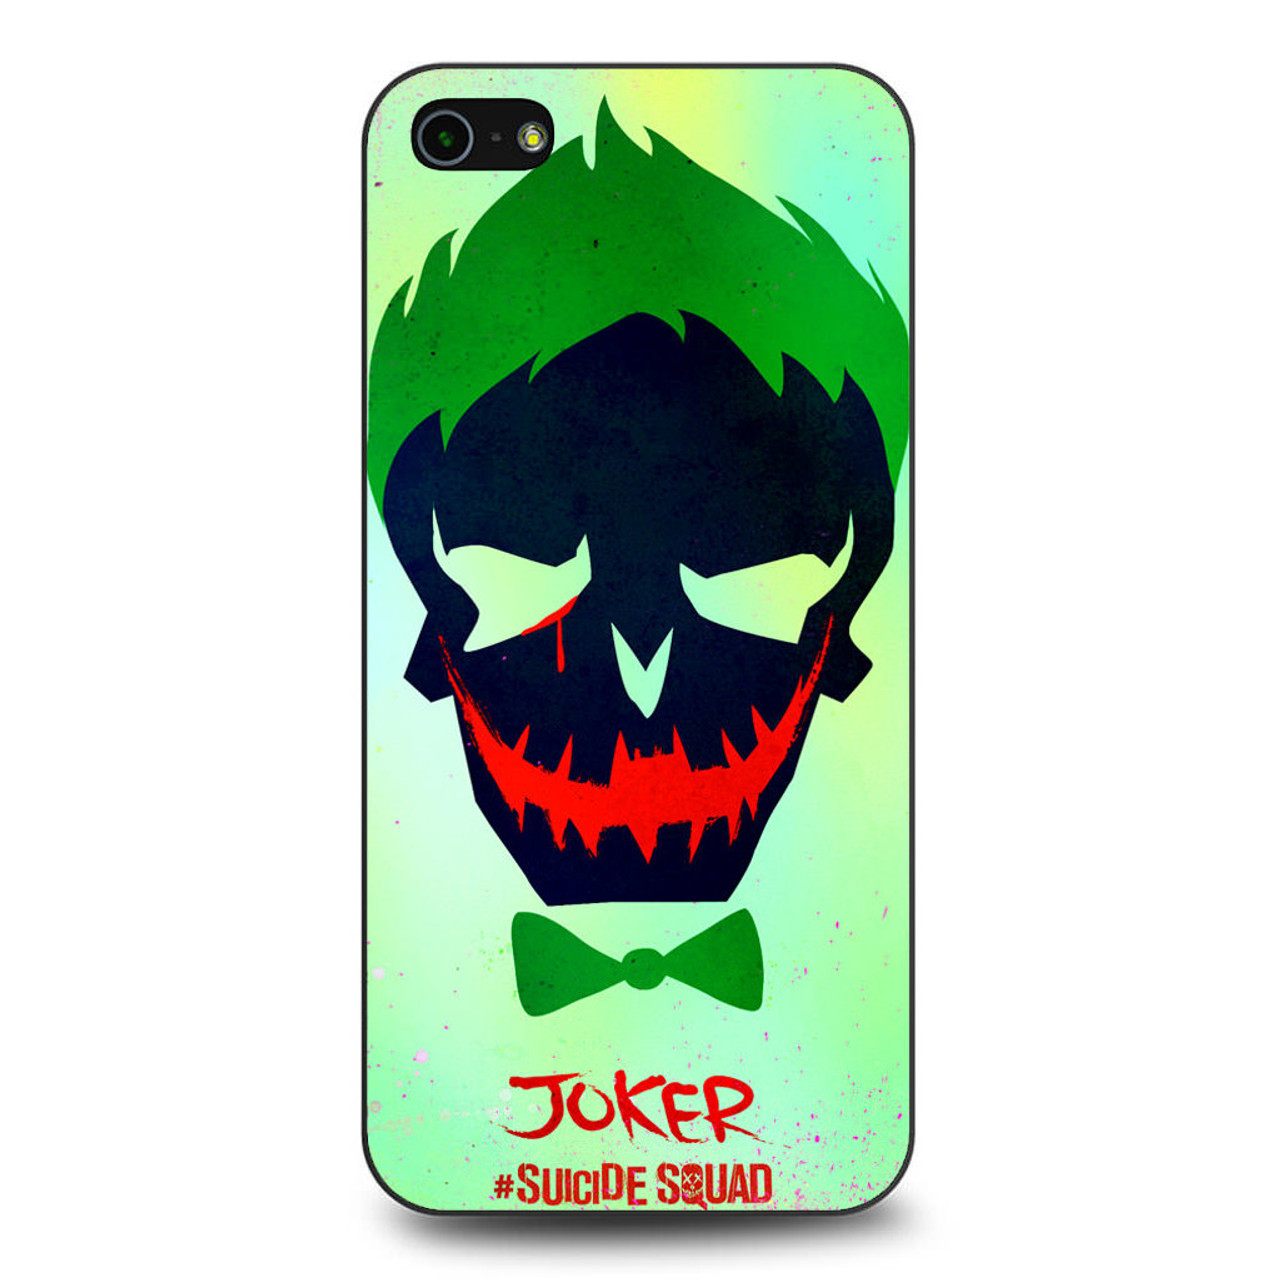 Movie suicide squad joker logo iphone 5 5s se case caseshunter